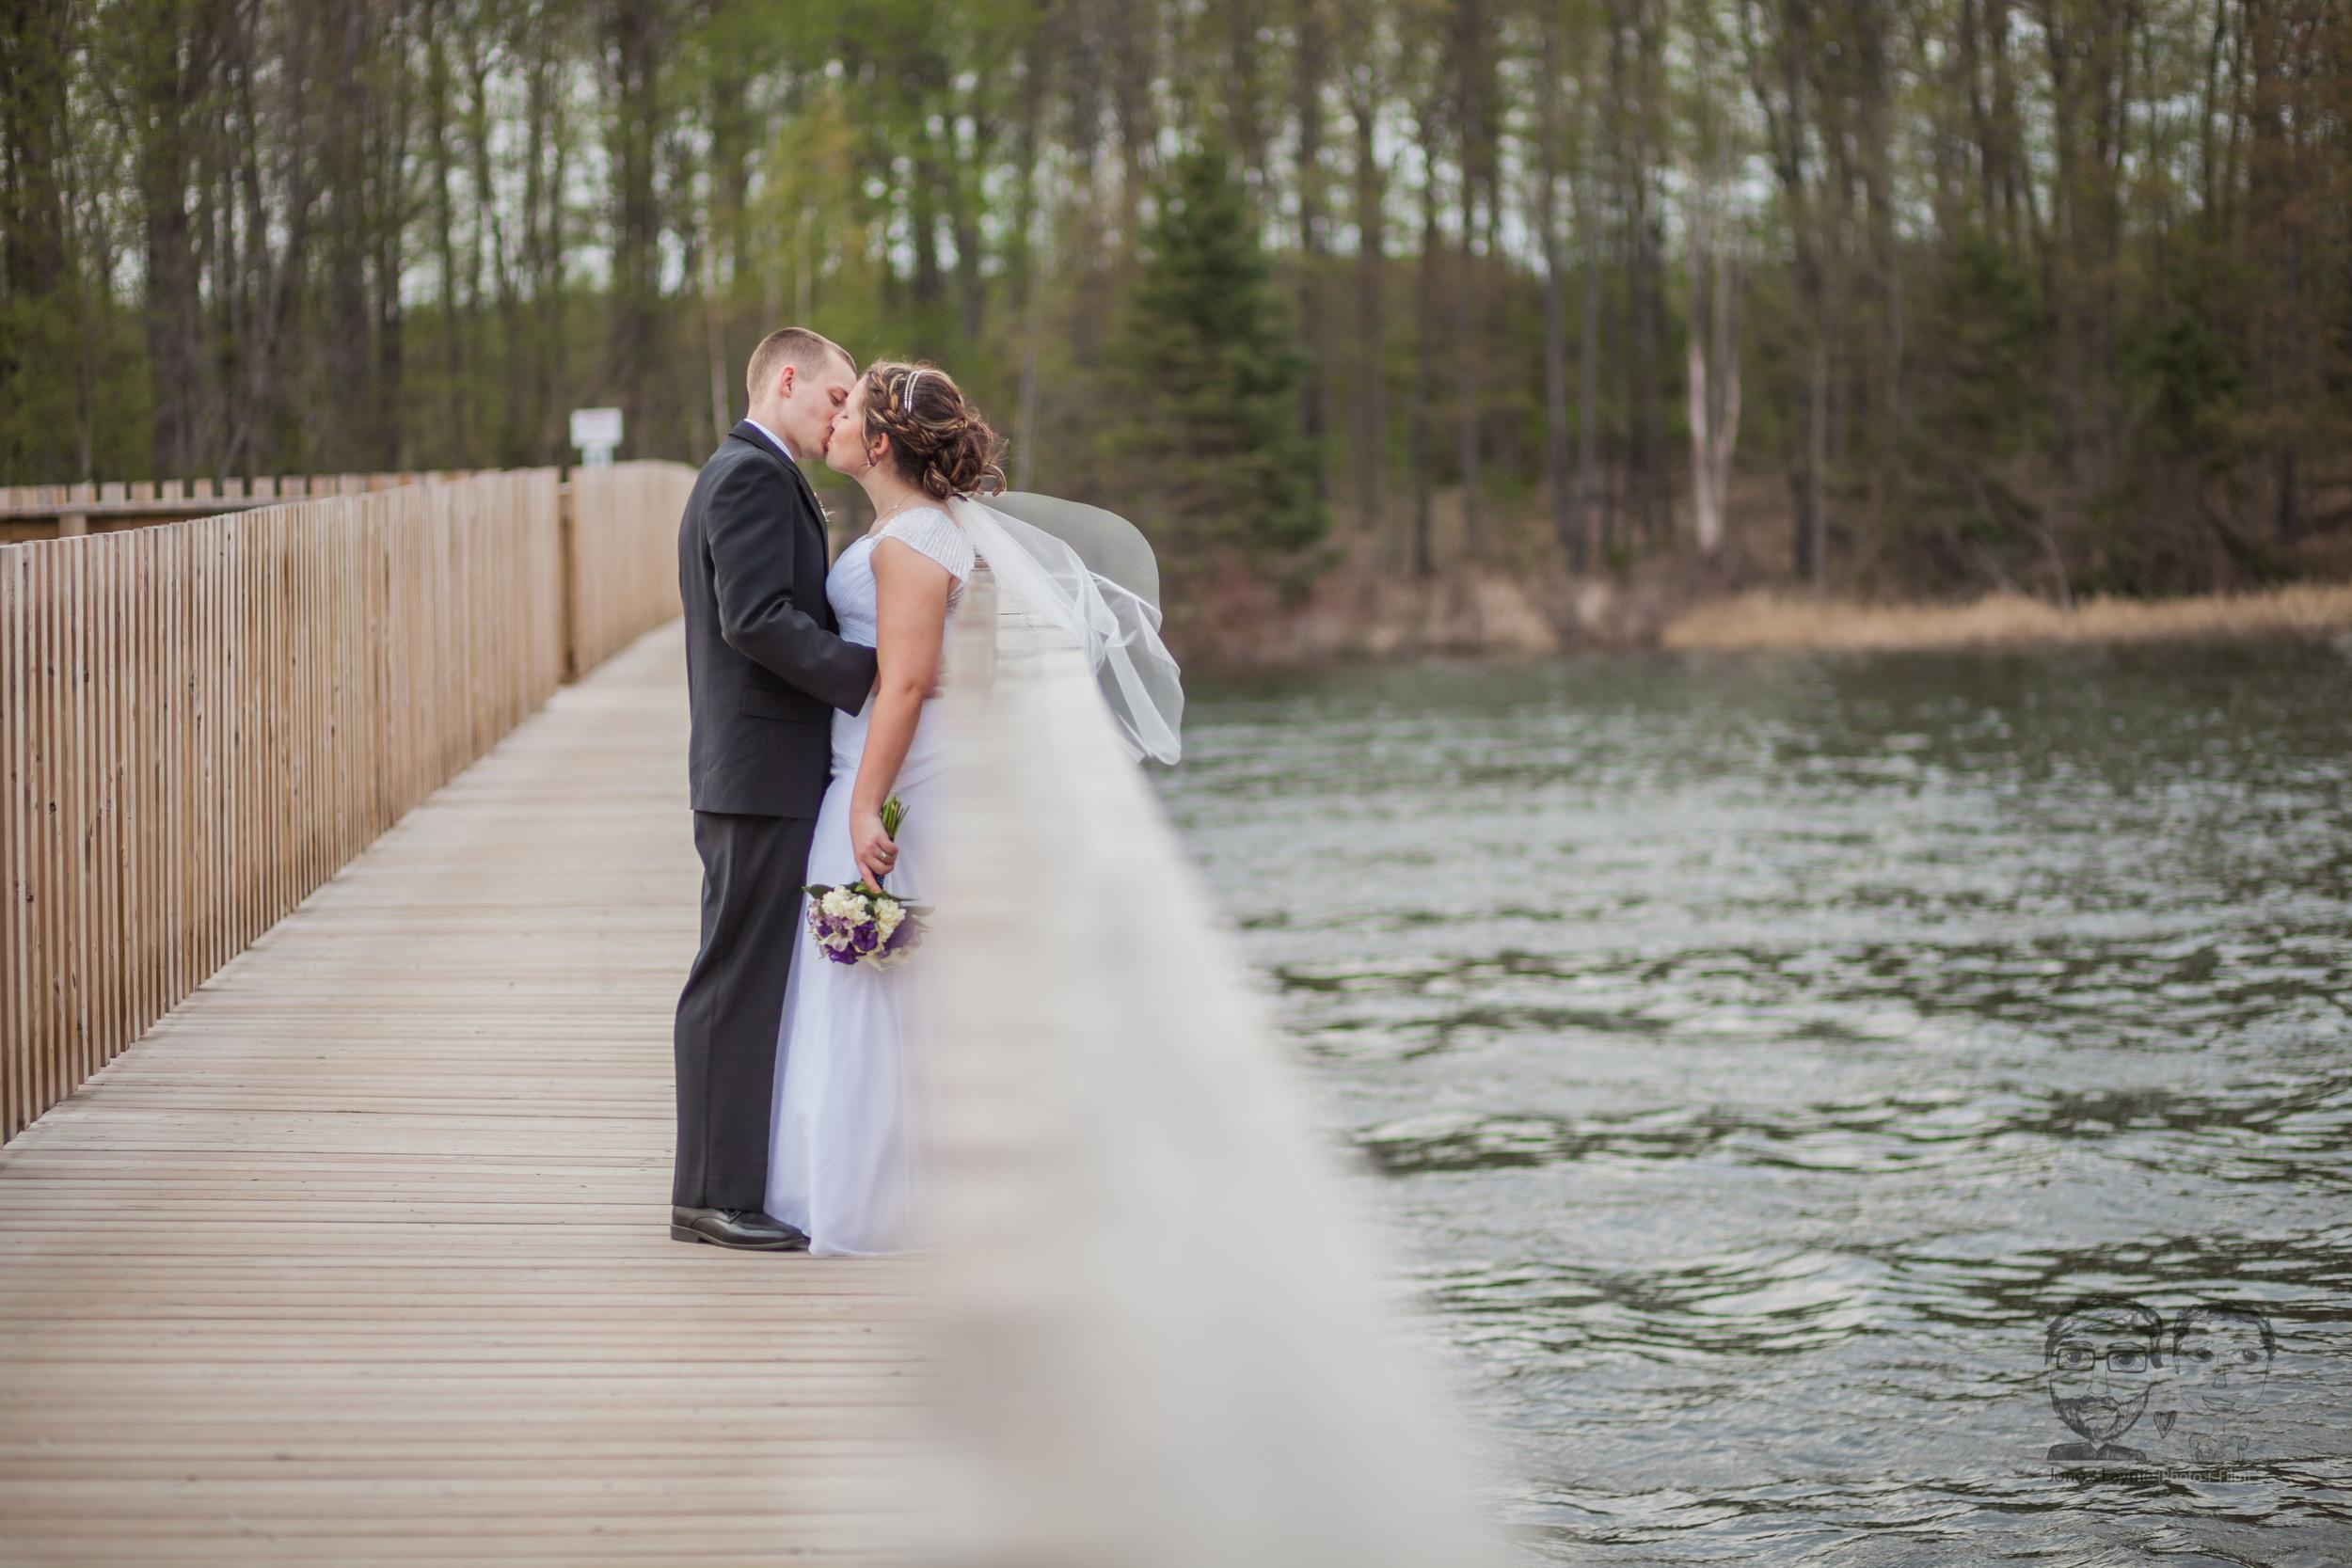 33Toronto Wedding Photographers and Videographers-Jono & Laynie Co.-Orangeville Wedding.jpg